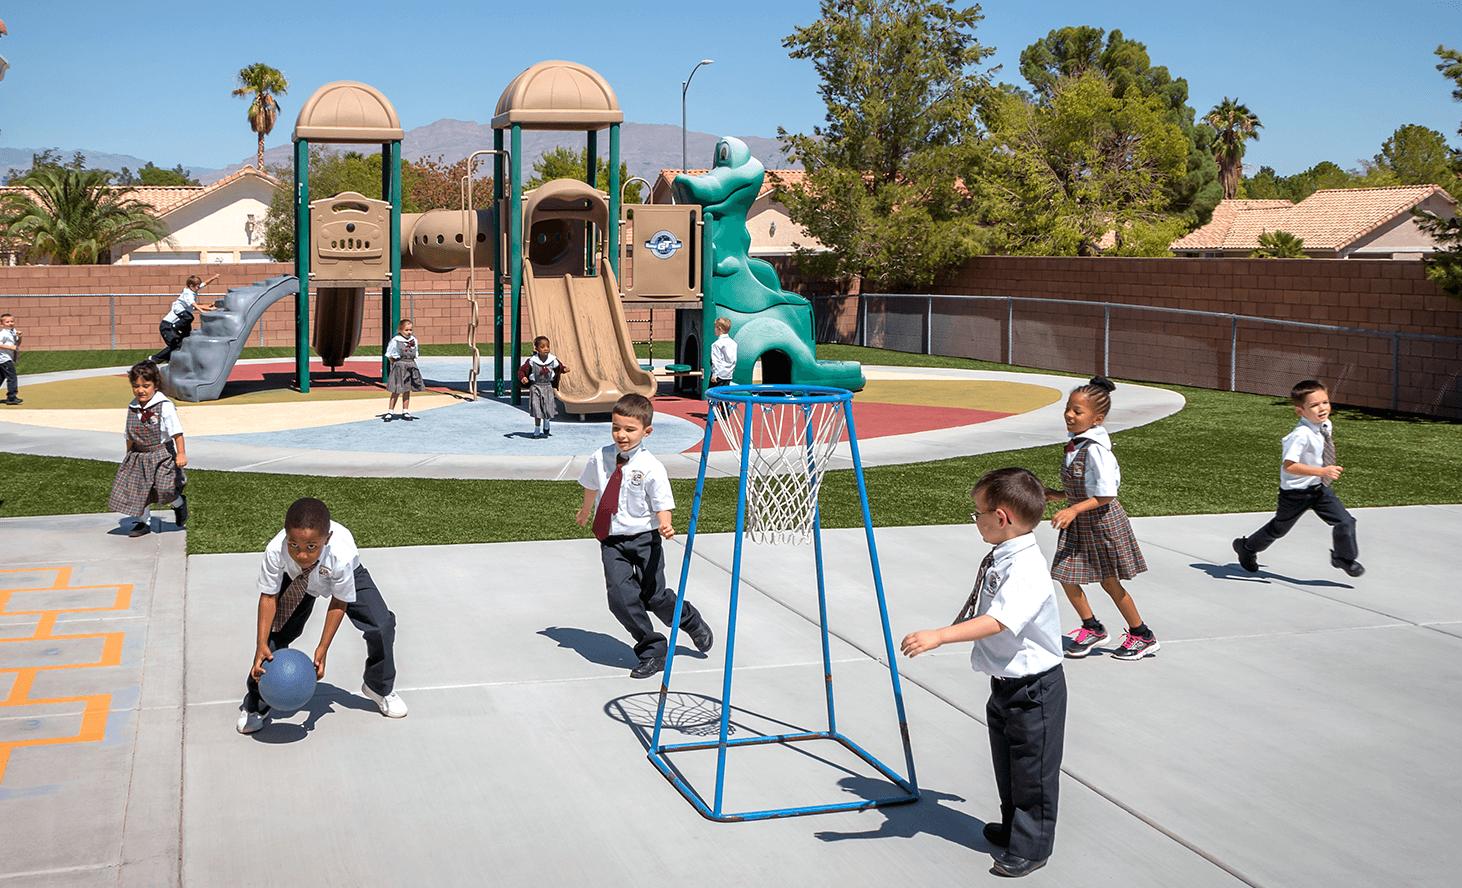 Playground Structure | Challenger School - Los Prados | Private School In Las Vegas, Nevada